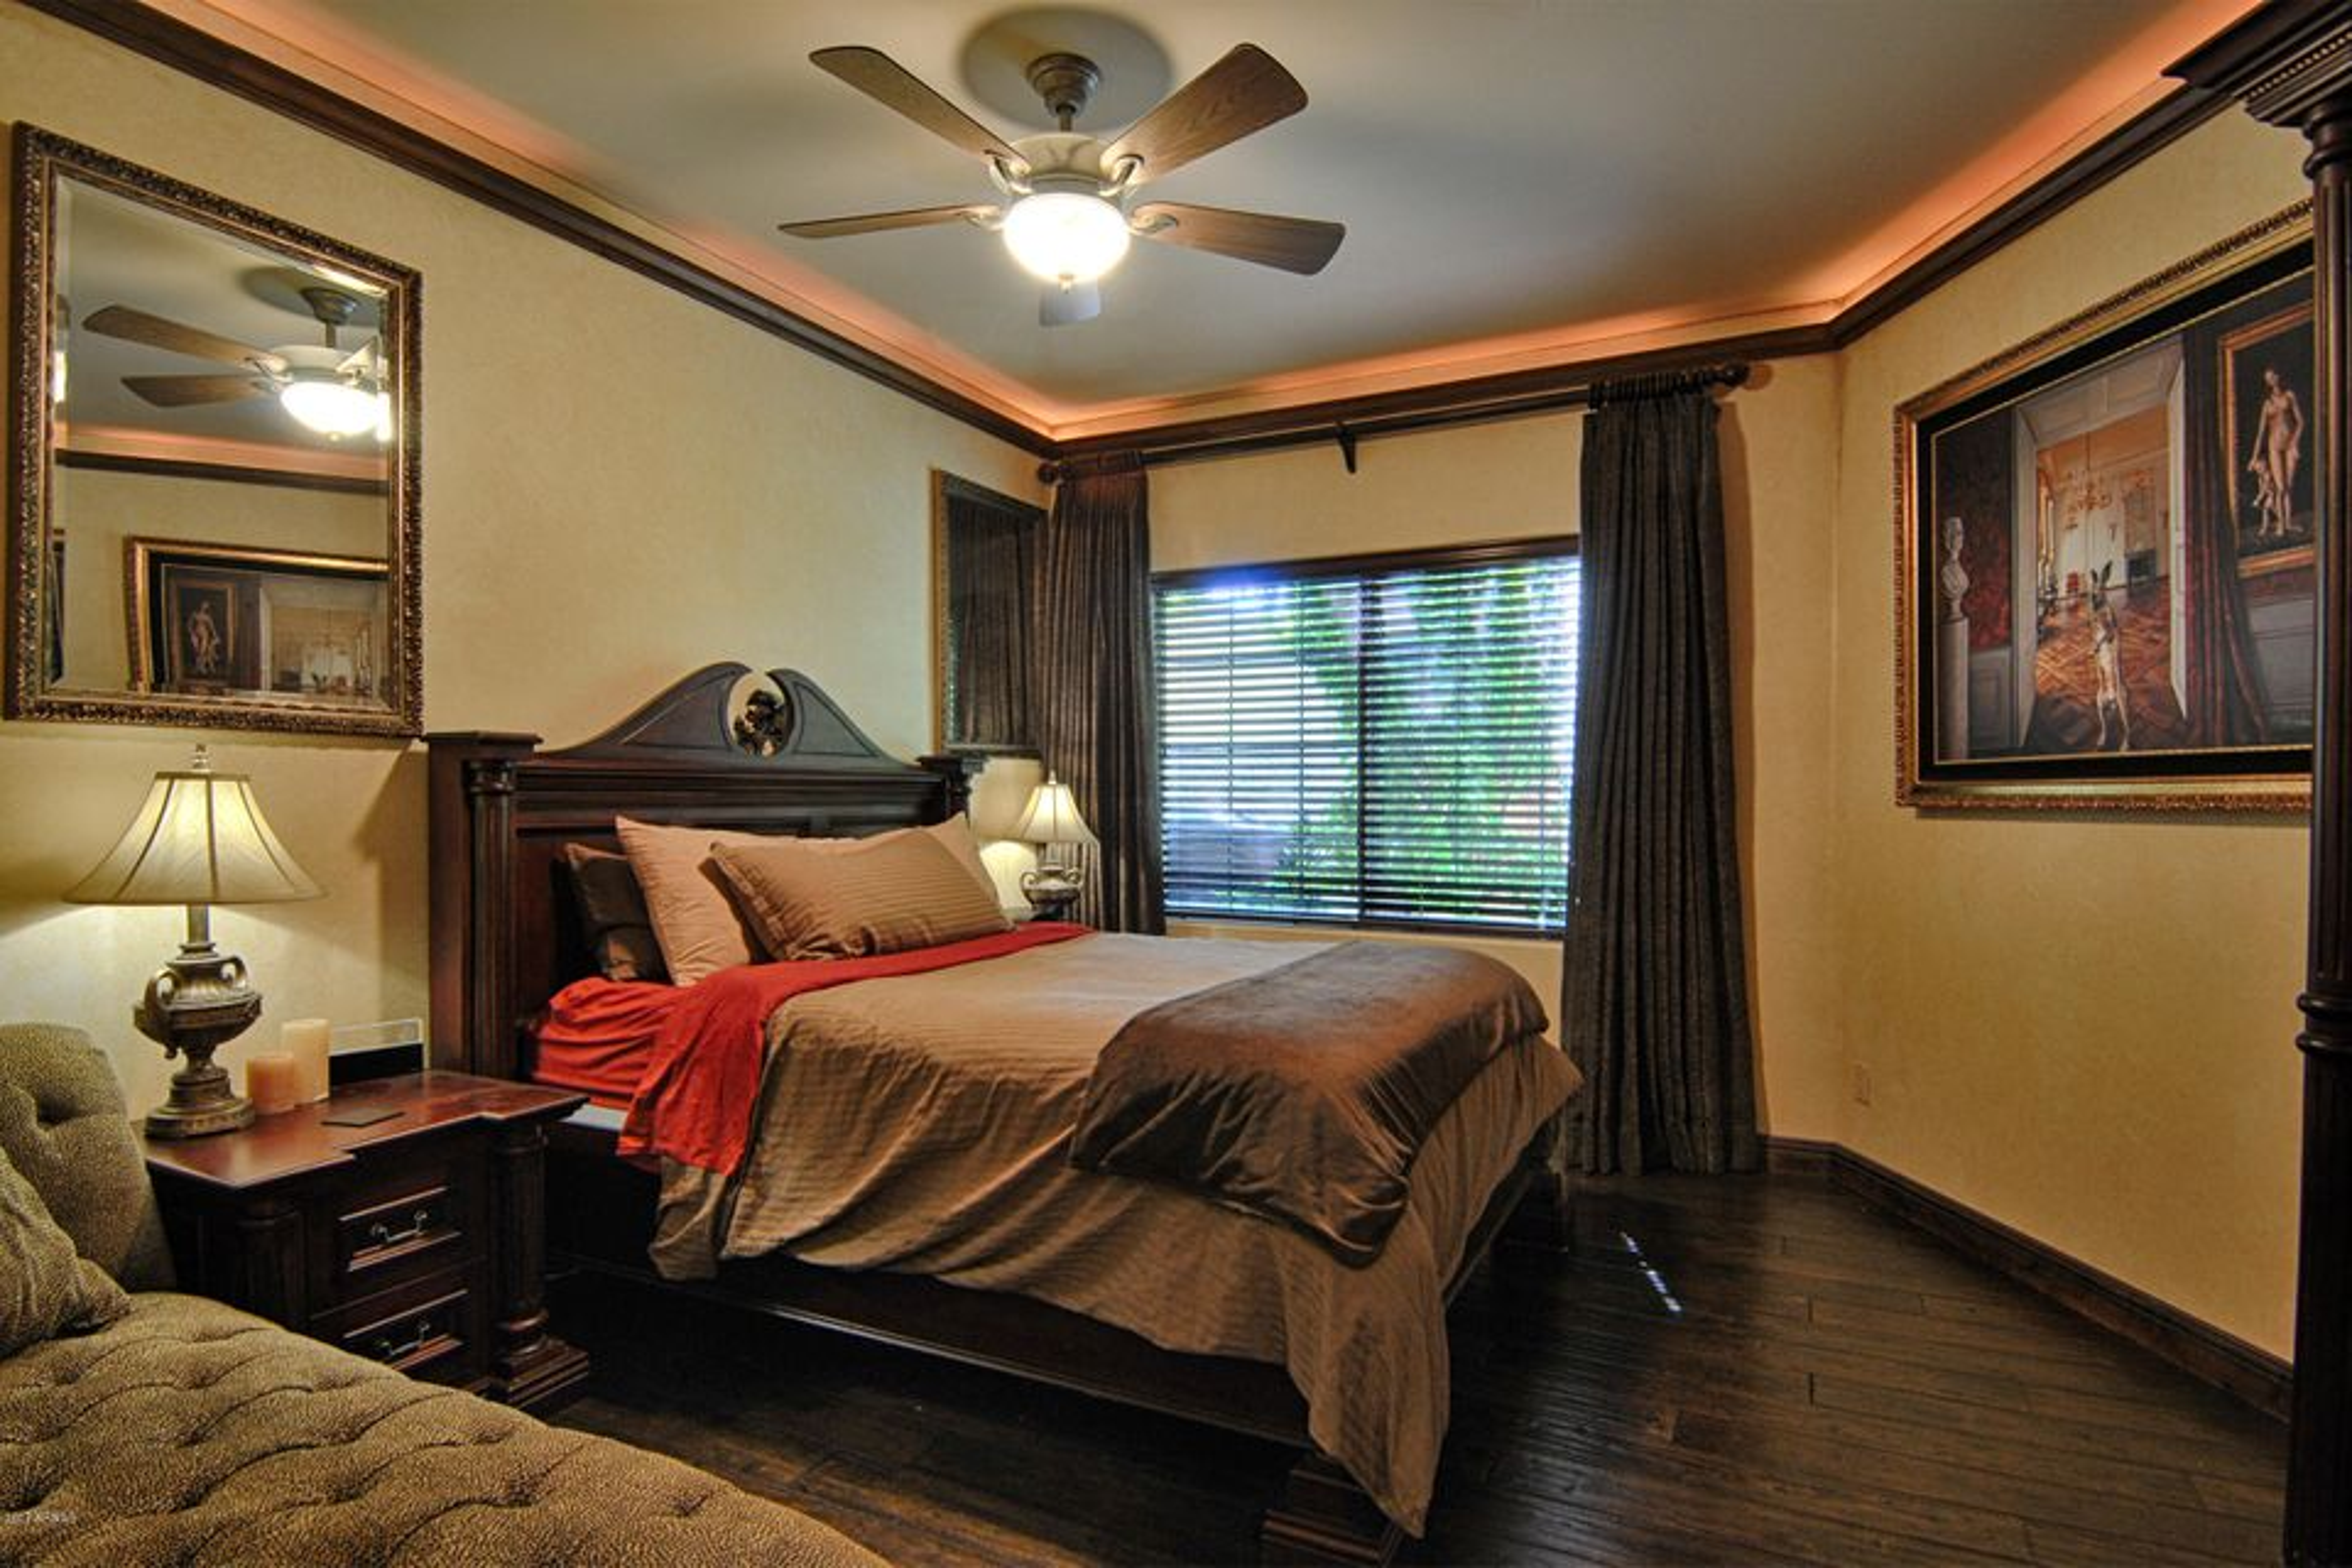 7209 E MCDONALD Drive Unit 9 Scottsdale, AZ 85250 - MLS #: 5655566